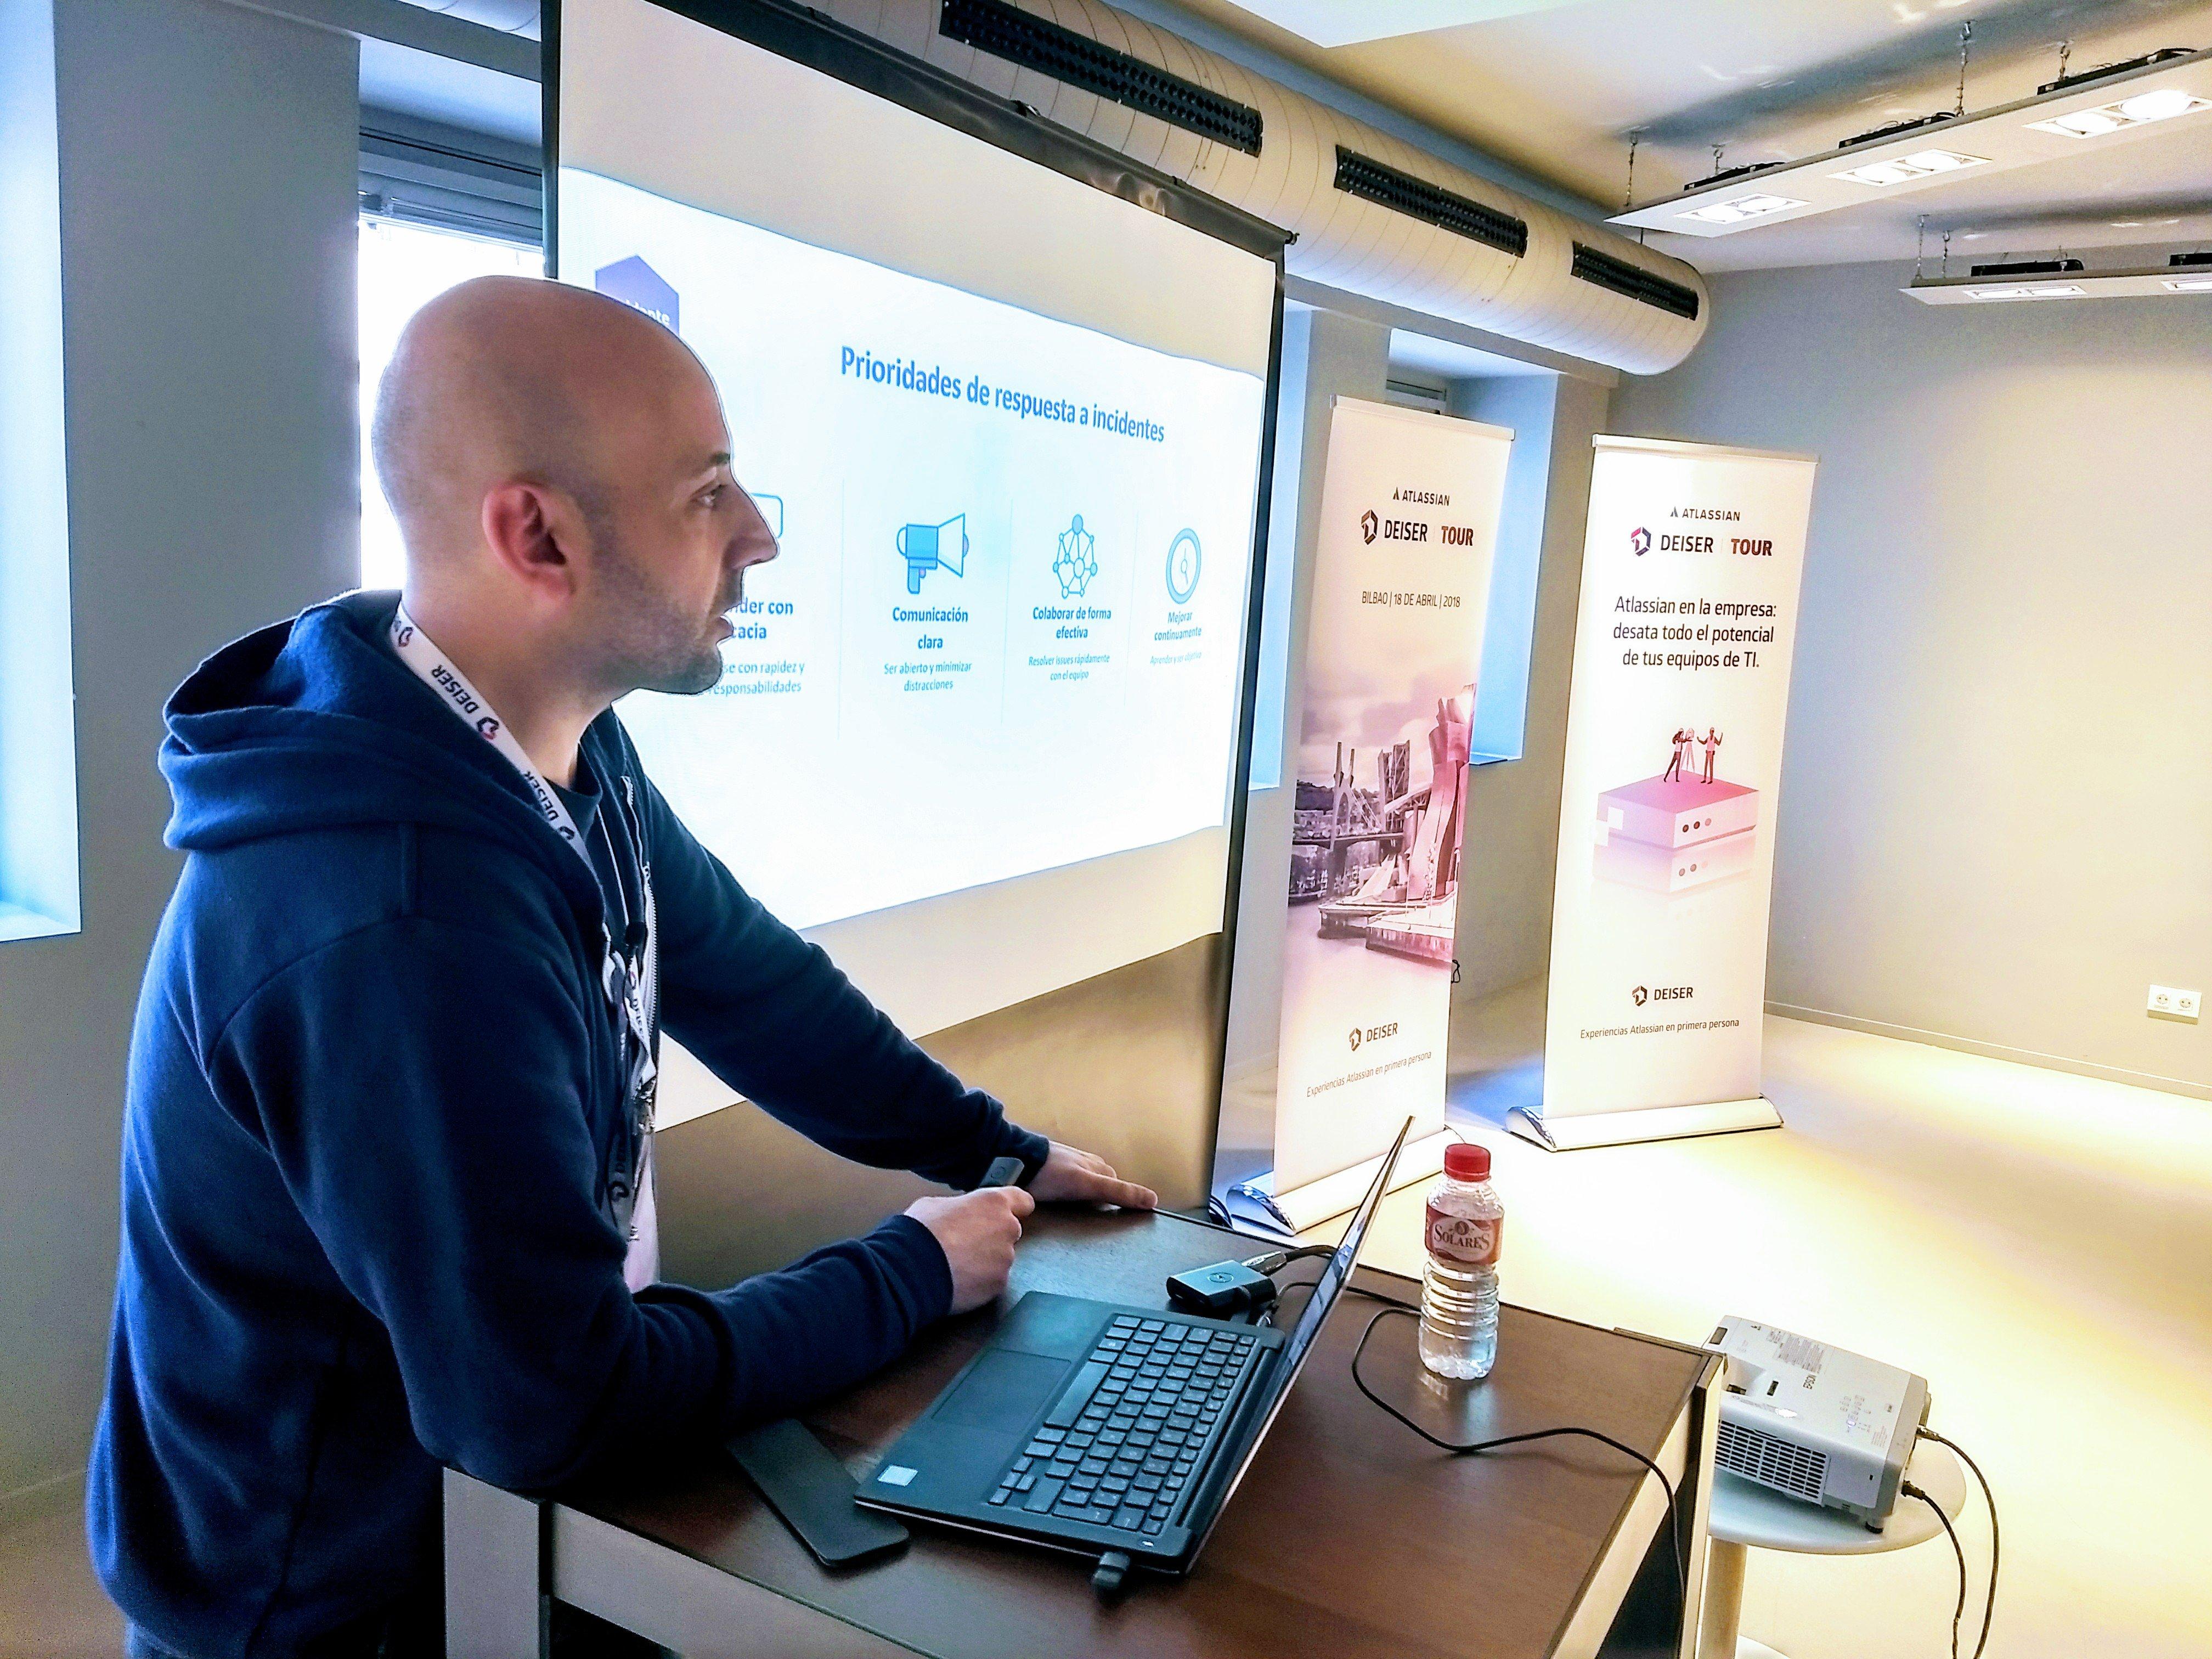 vision-ITSM-Atlassian_Jira-Service-Desk_DEISER-tour_Bilbao_Jose-Jimenez